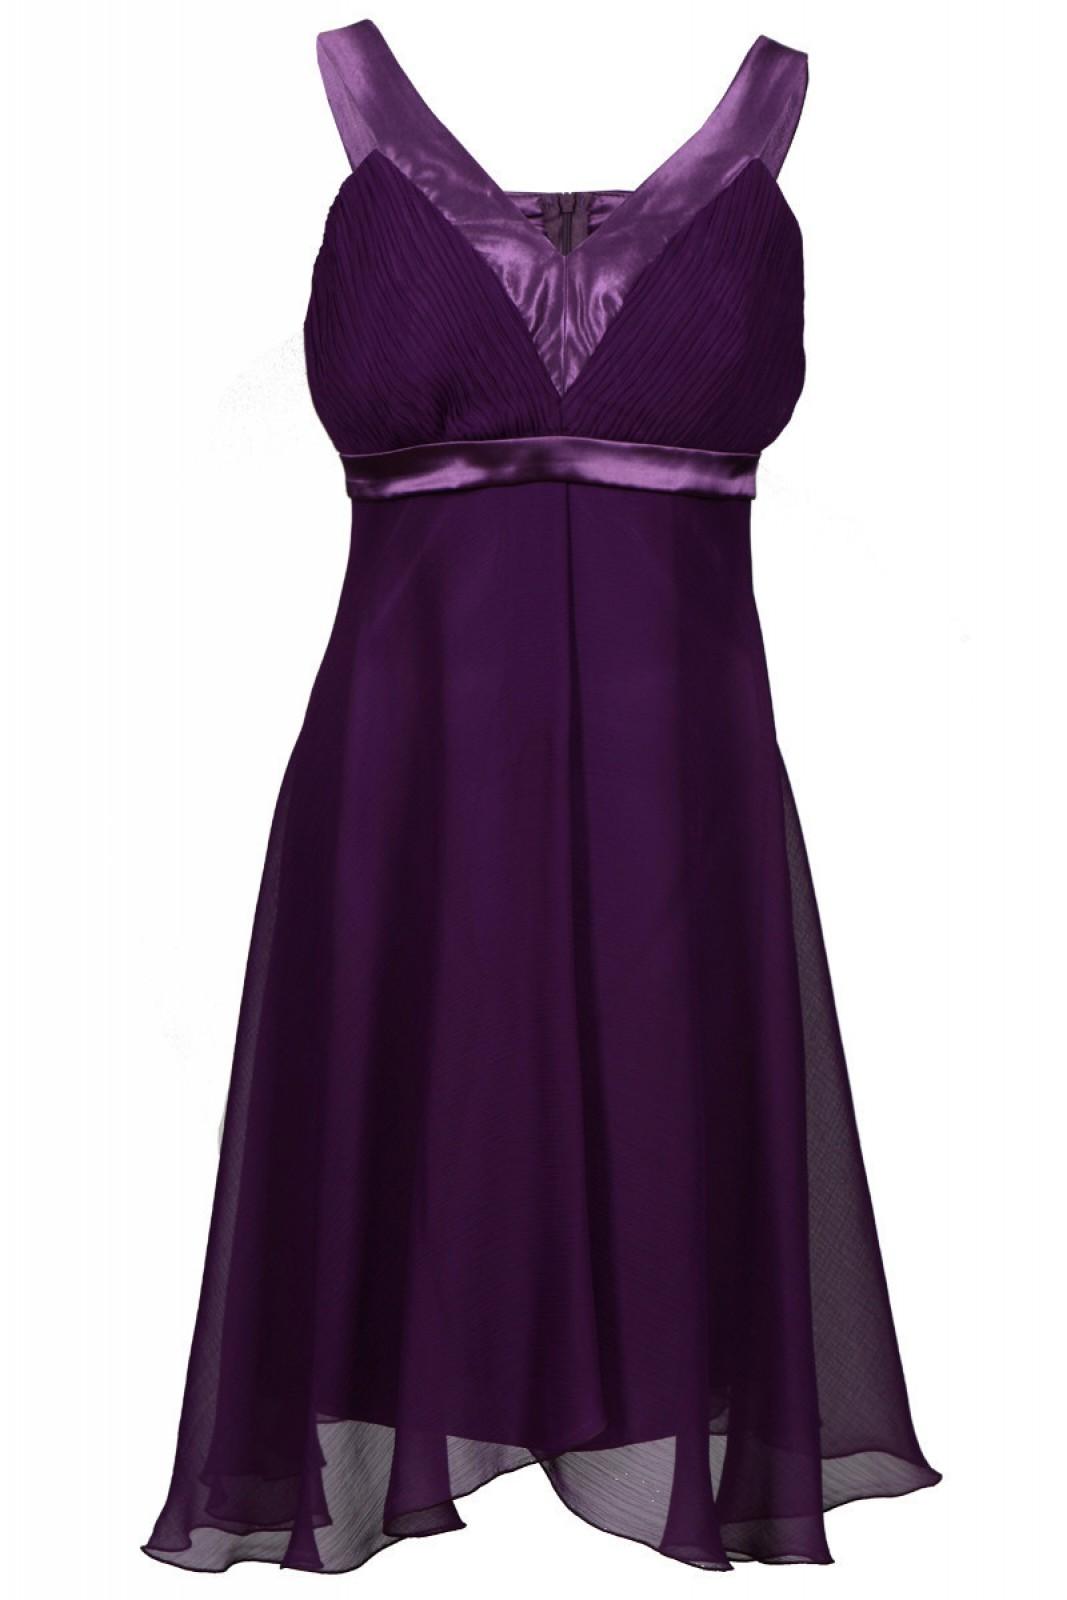 Chiffon kleider lila